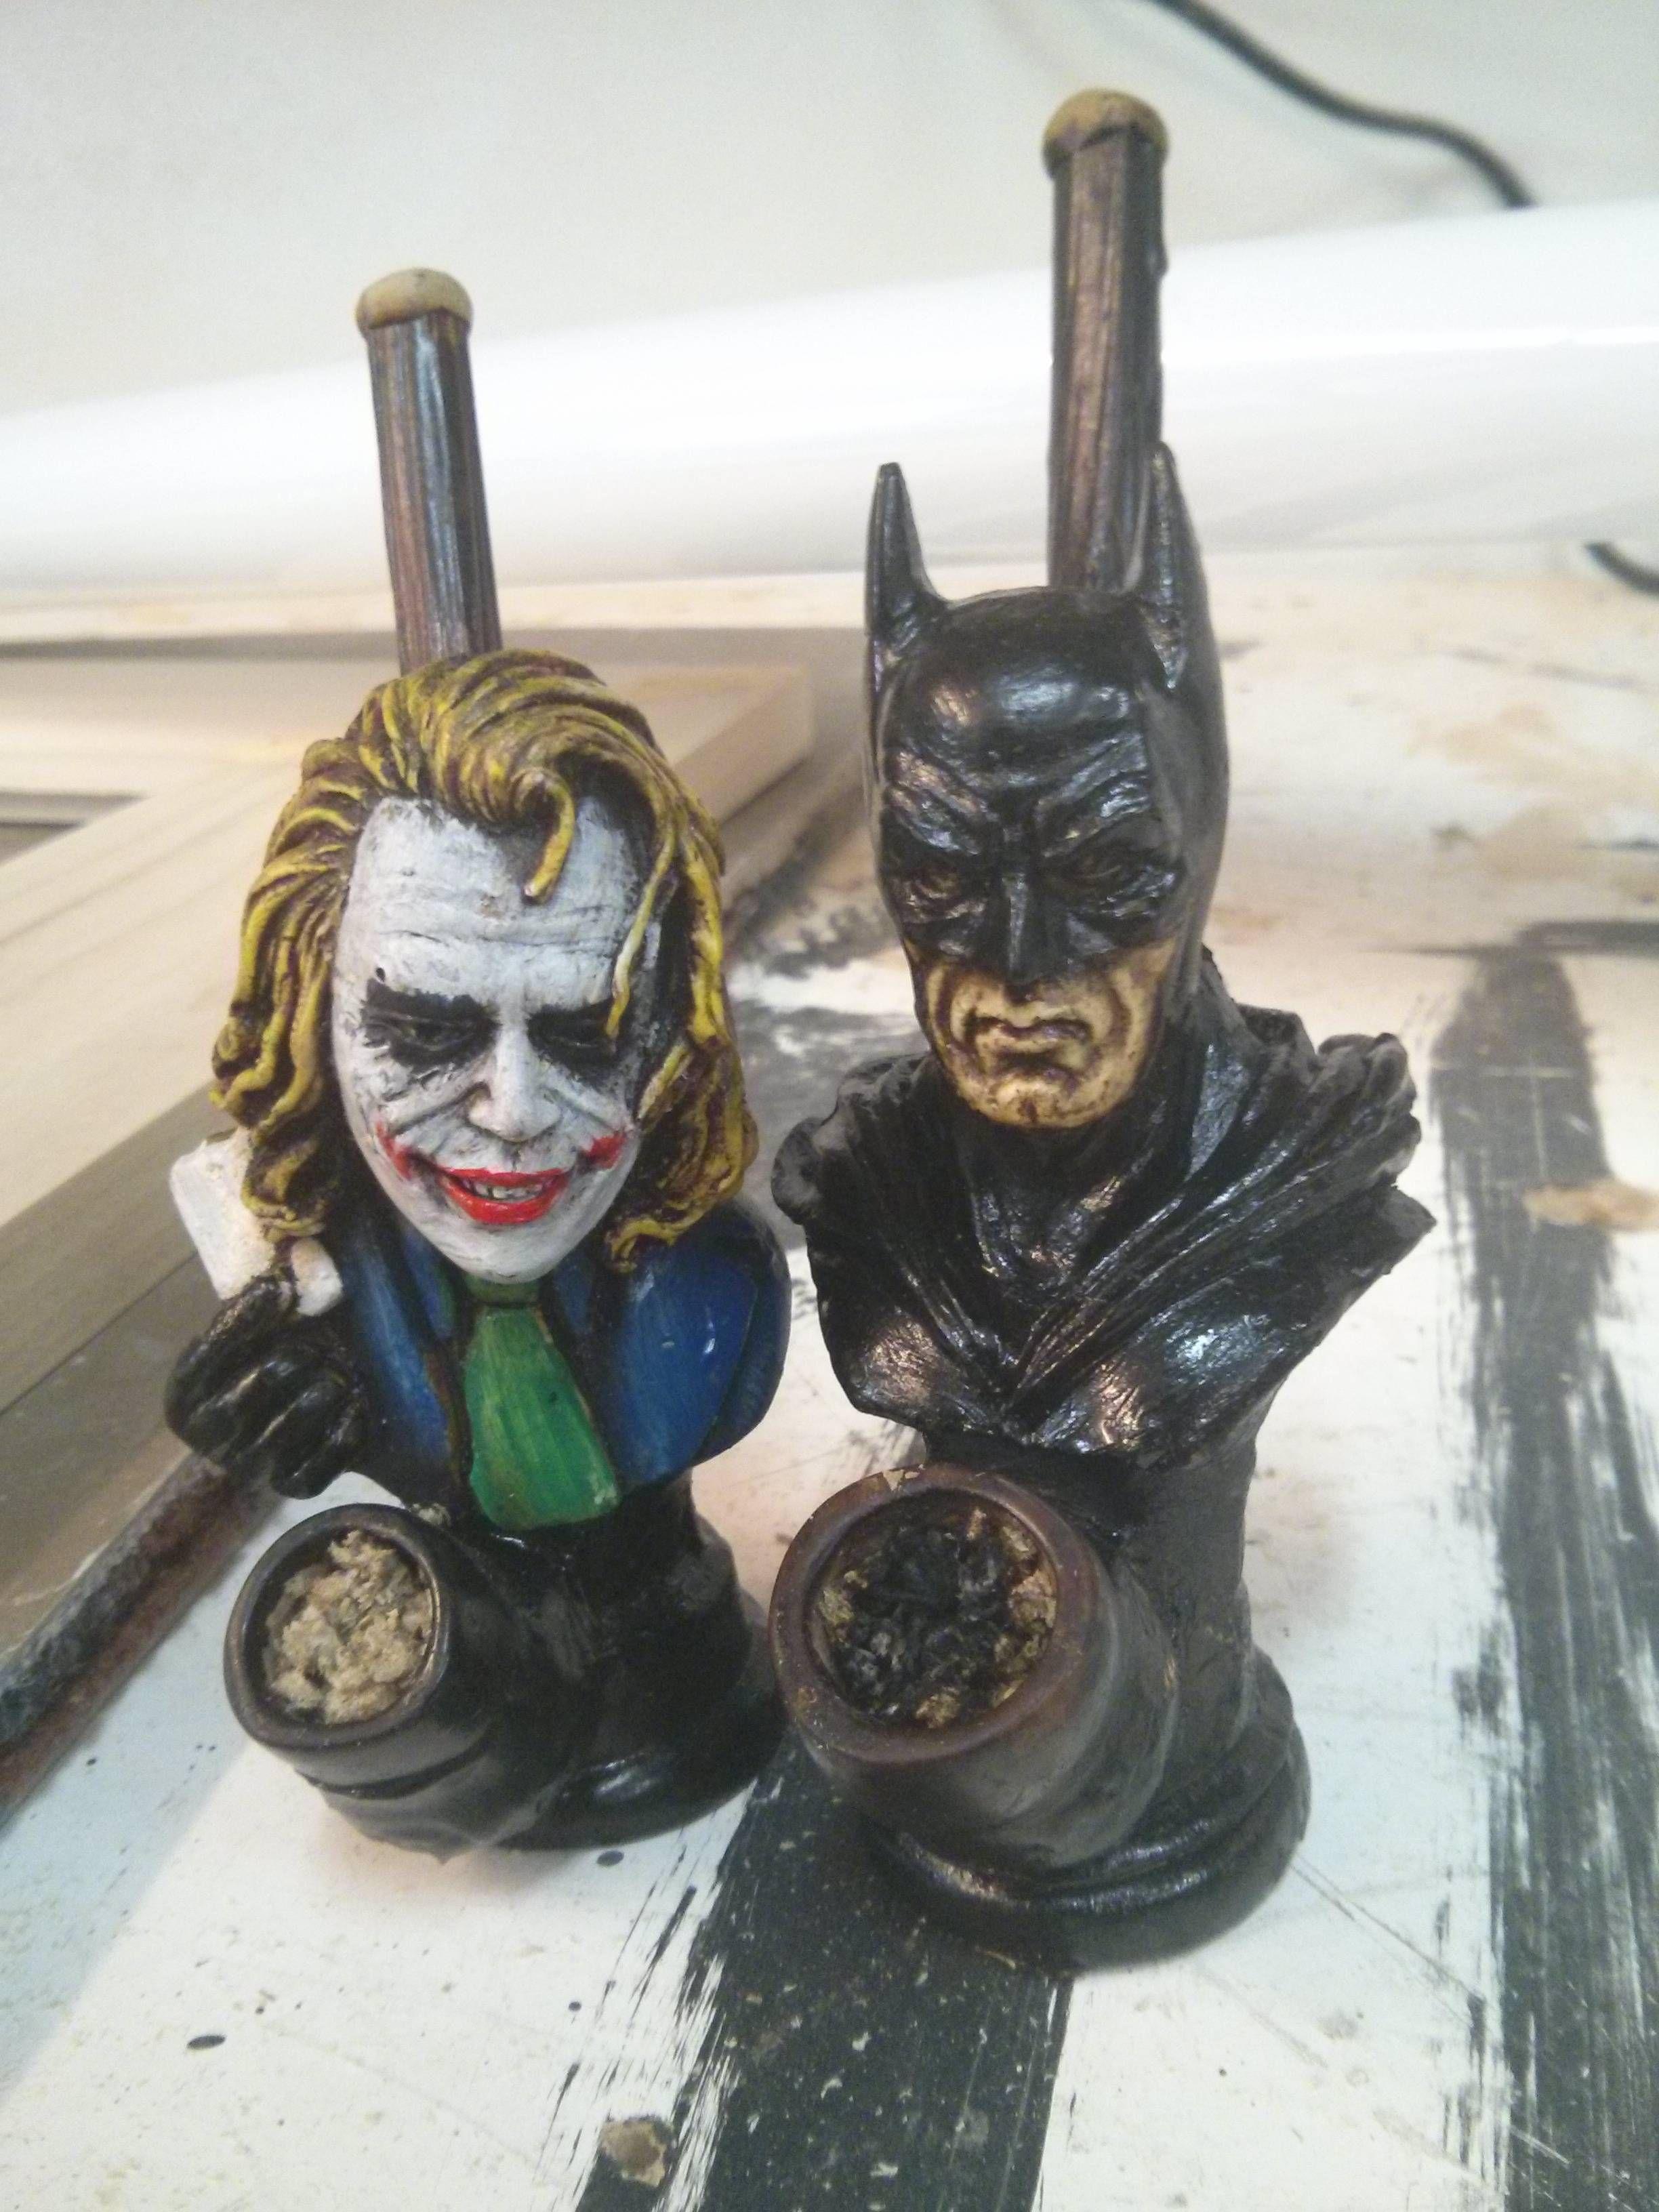 Joker and Batman ceramic smoking pipes #marijuana | Famous Tokers ...